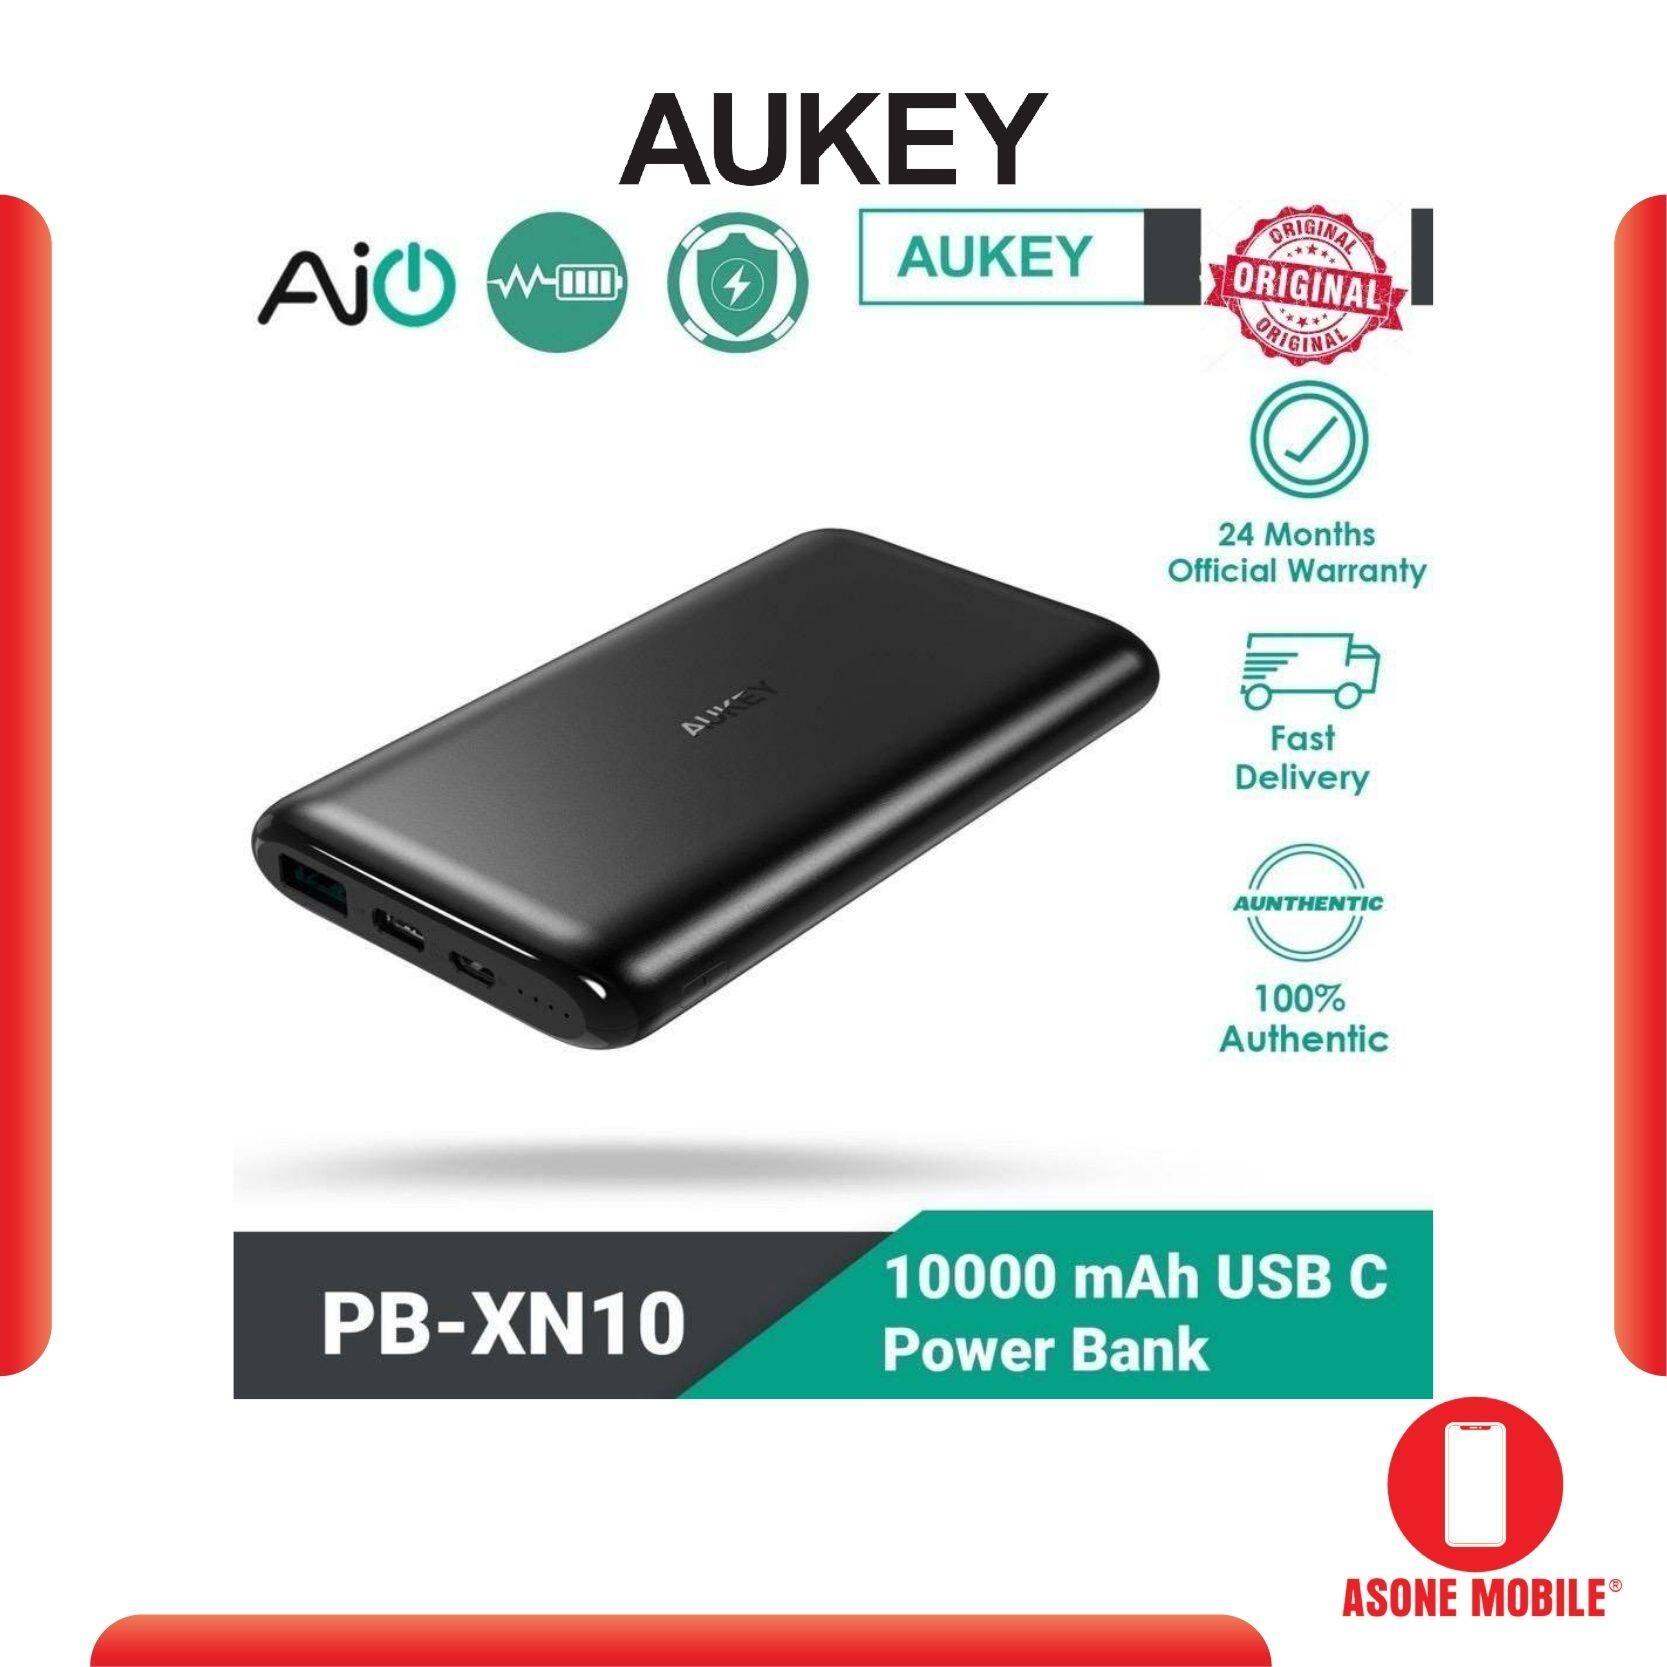 Original Aukey PB-XN10 USB-C Power Bank (10000mAh) 2 year warranty